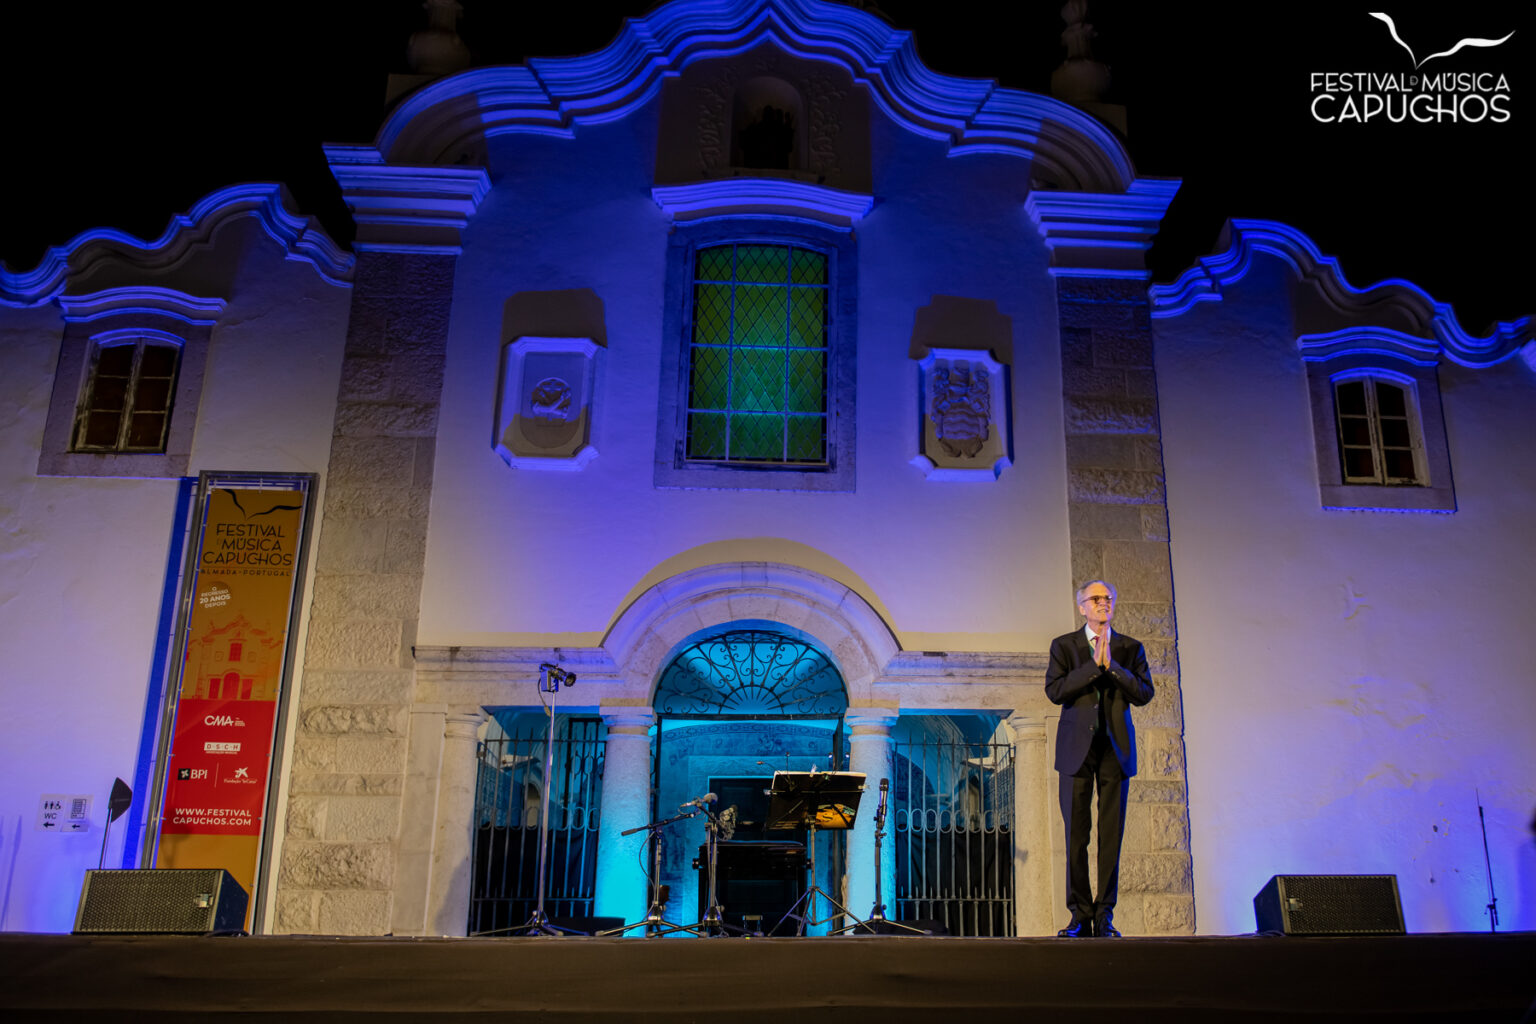 "FESTIVAL DOS CAPUCHOS - Recital de Alaúde e Vihuela por Hopkinson Smith""El Siglo de Oro, the Golden Age: Música Espanhola e Inglesa do Renascimento""Hopkinson Smith, alaúde e vihuela"